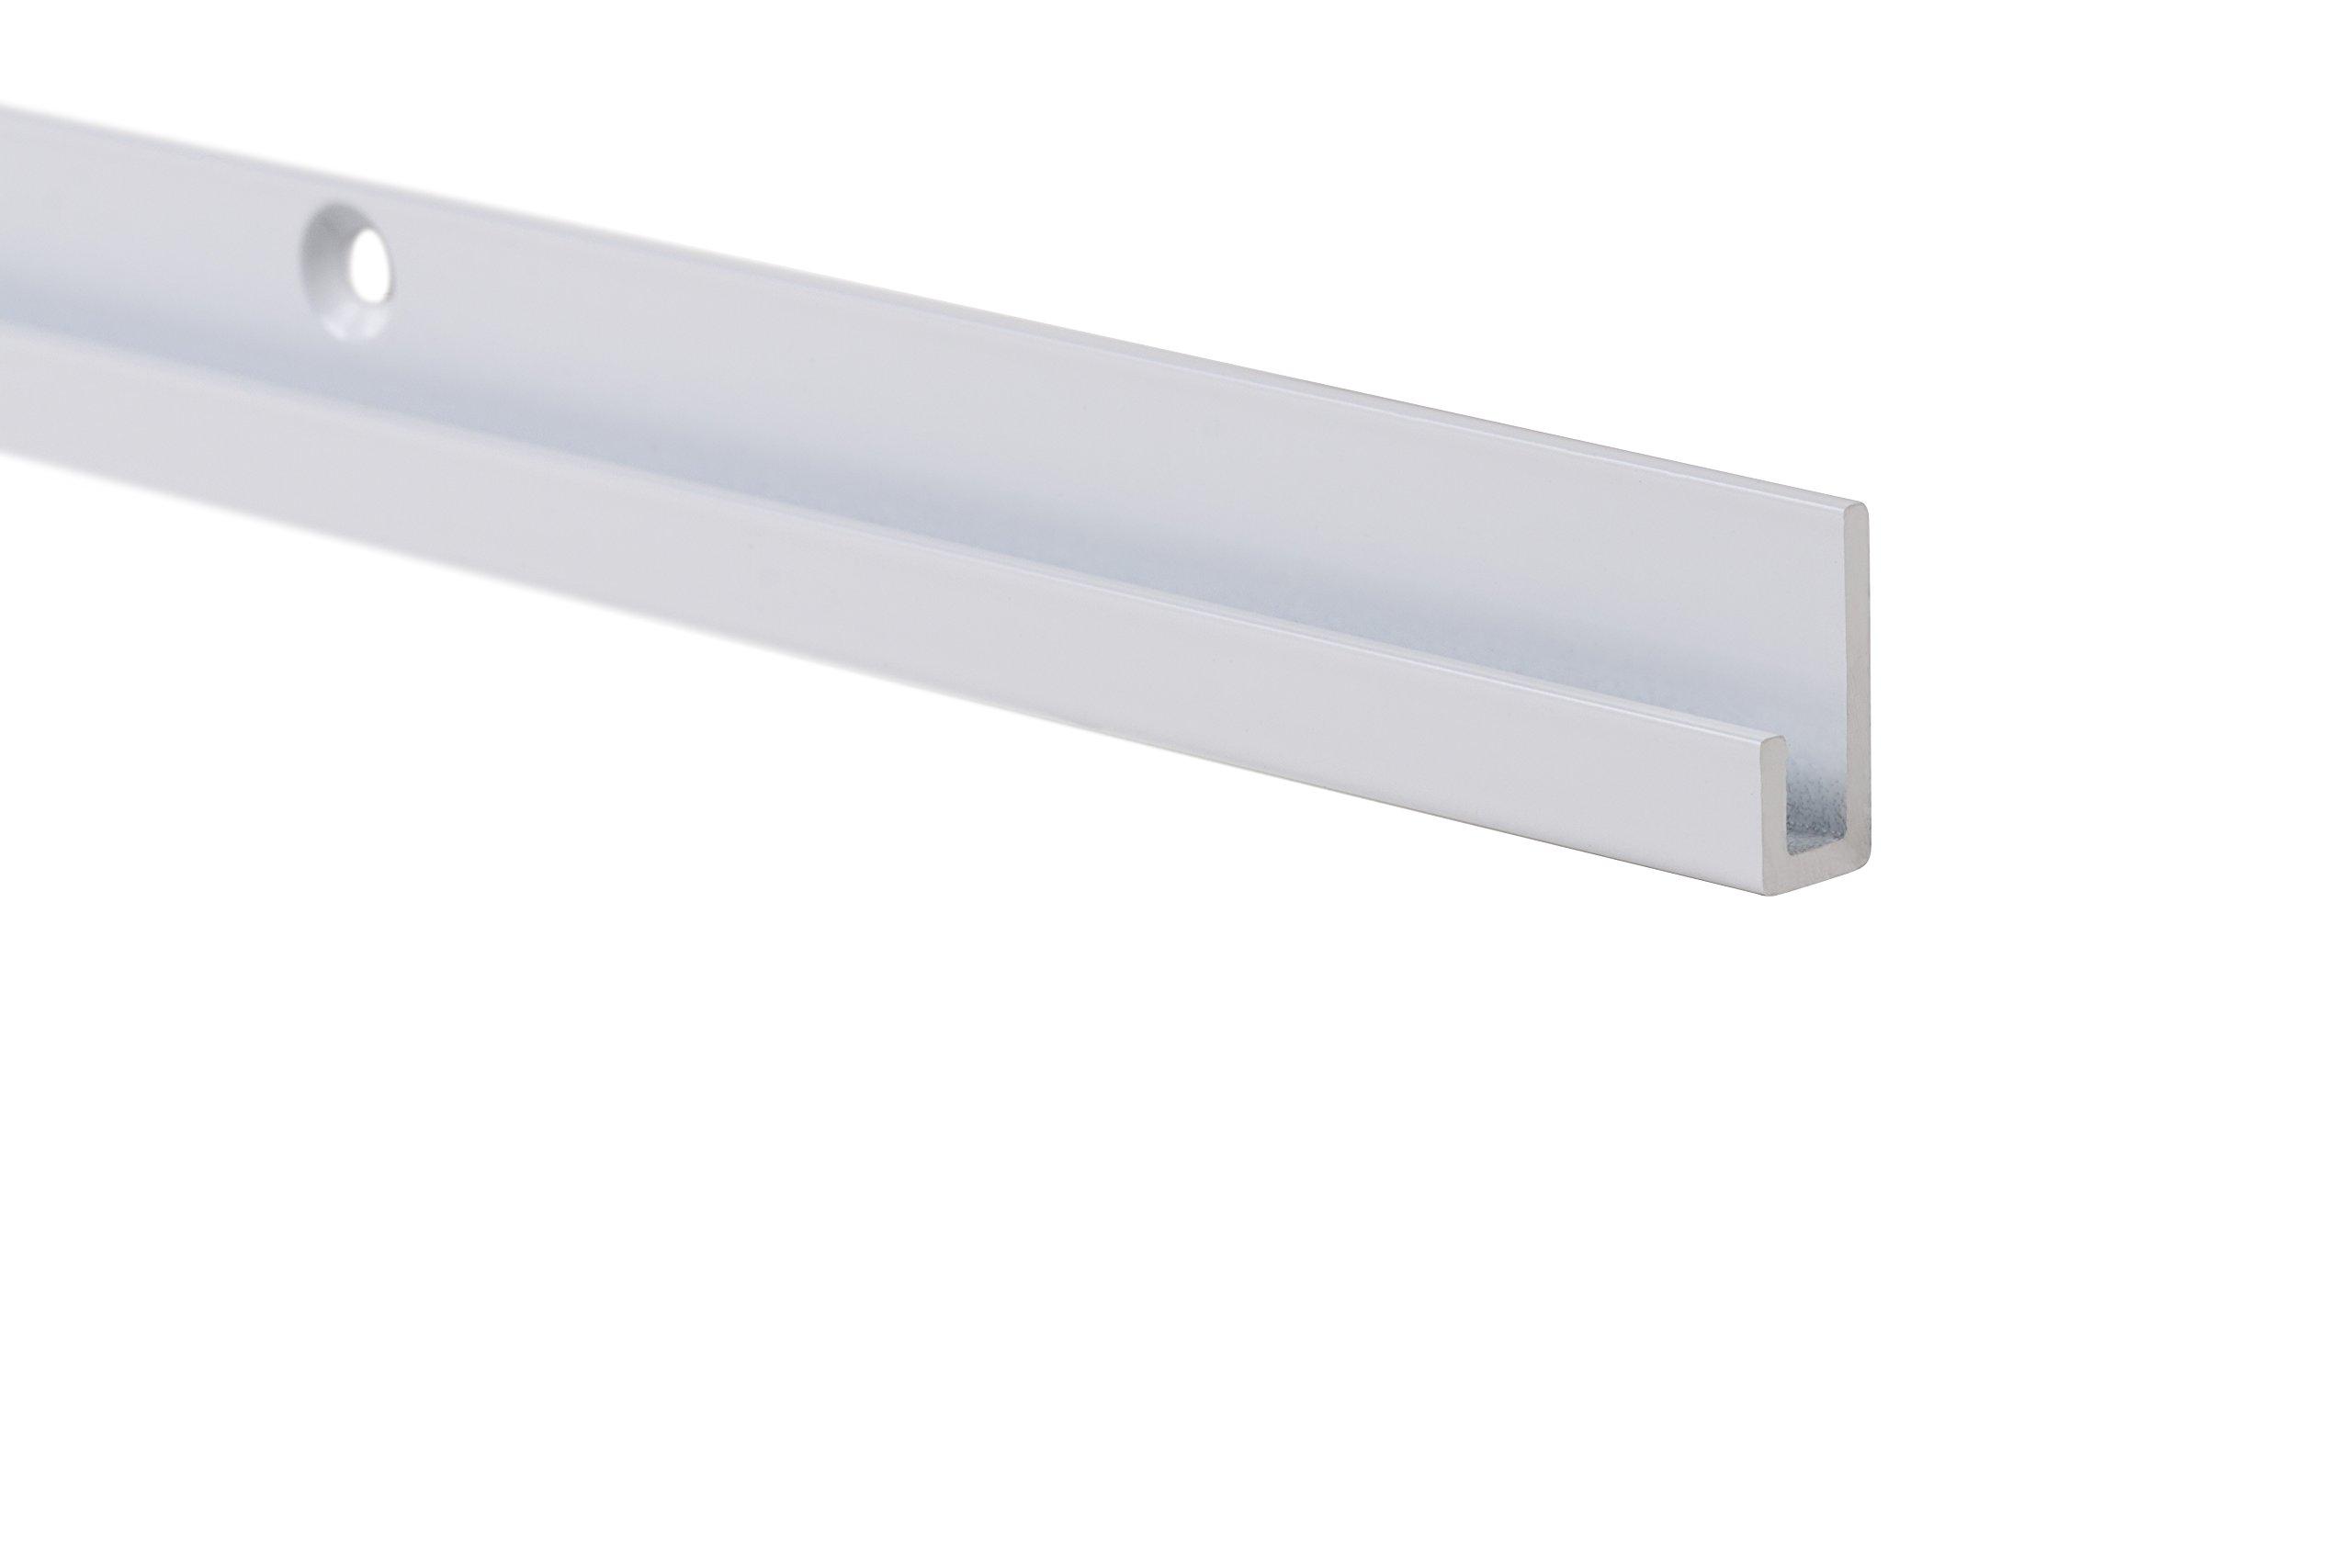 STAS j-rail max alu 200cm 78.75 inch + installation kit